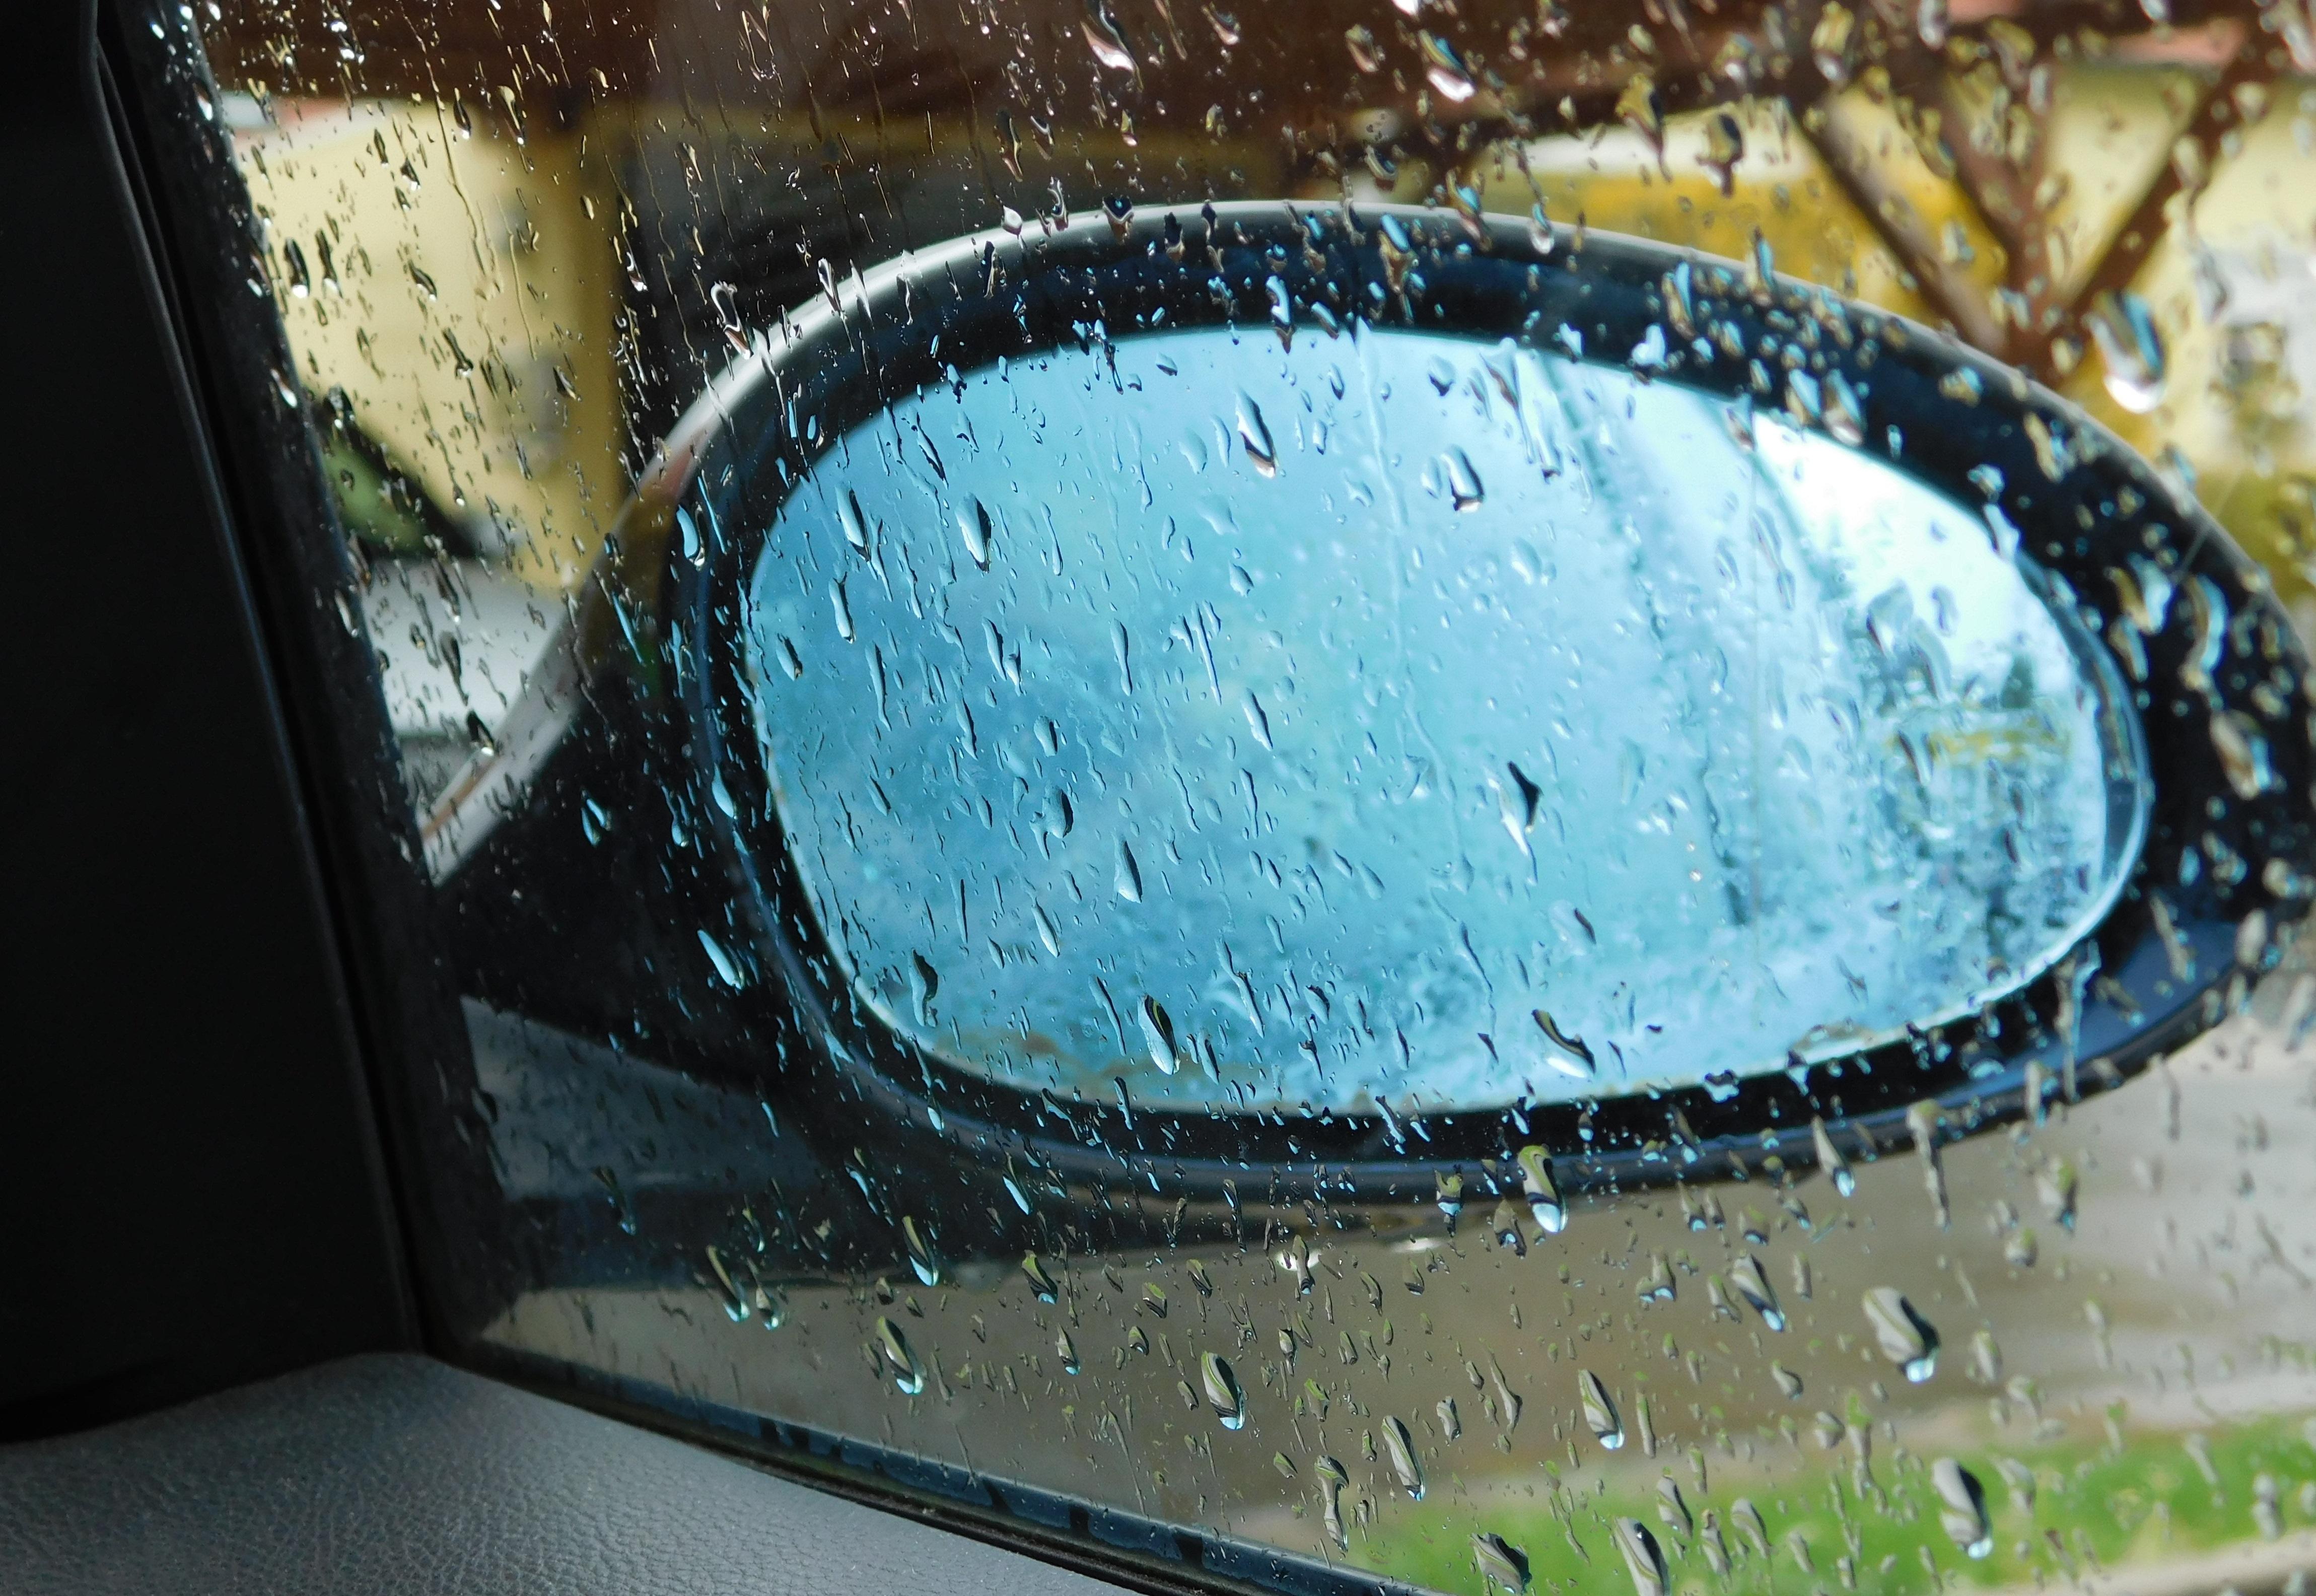 Gambar Jendela Titisan Hujan Basah Biru Menitik Cermin Mobil